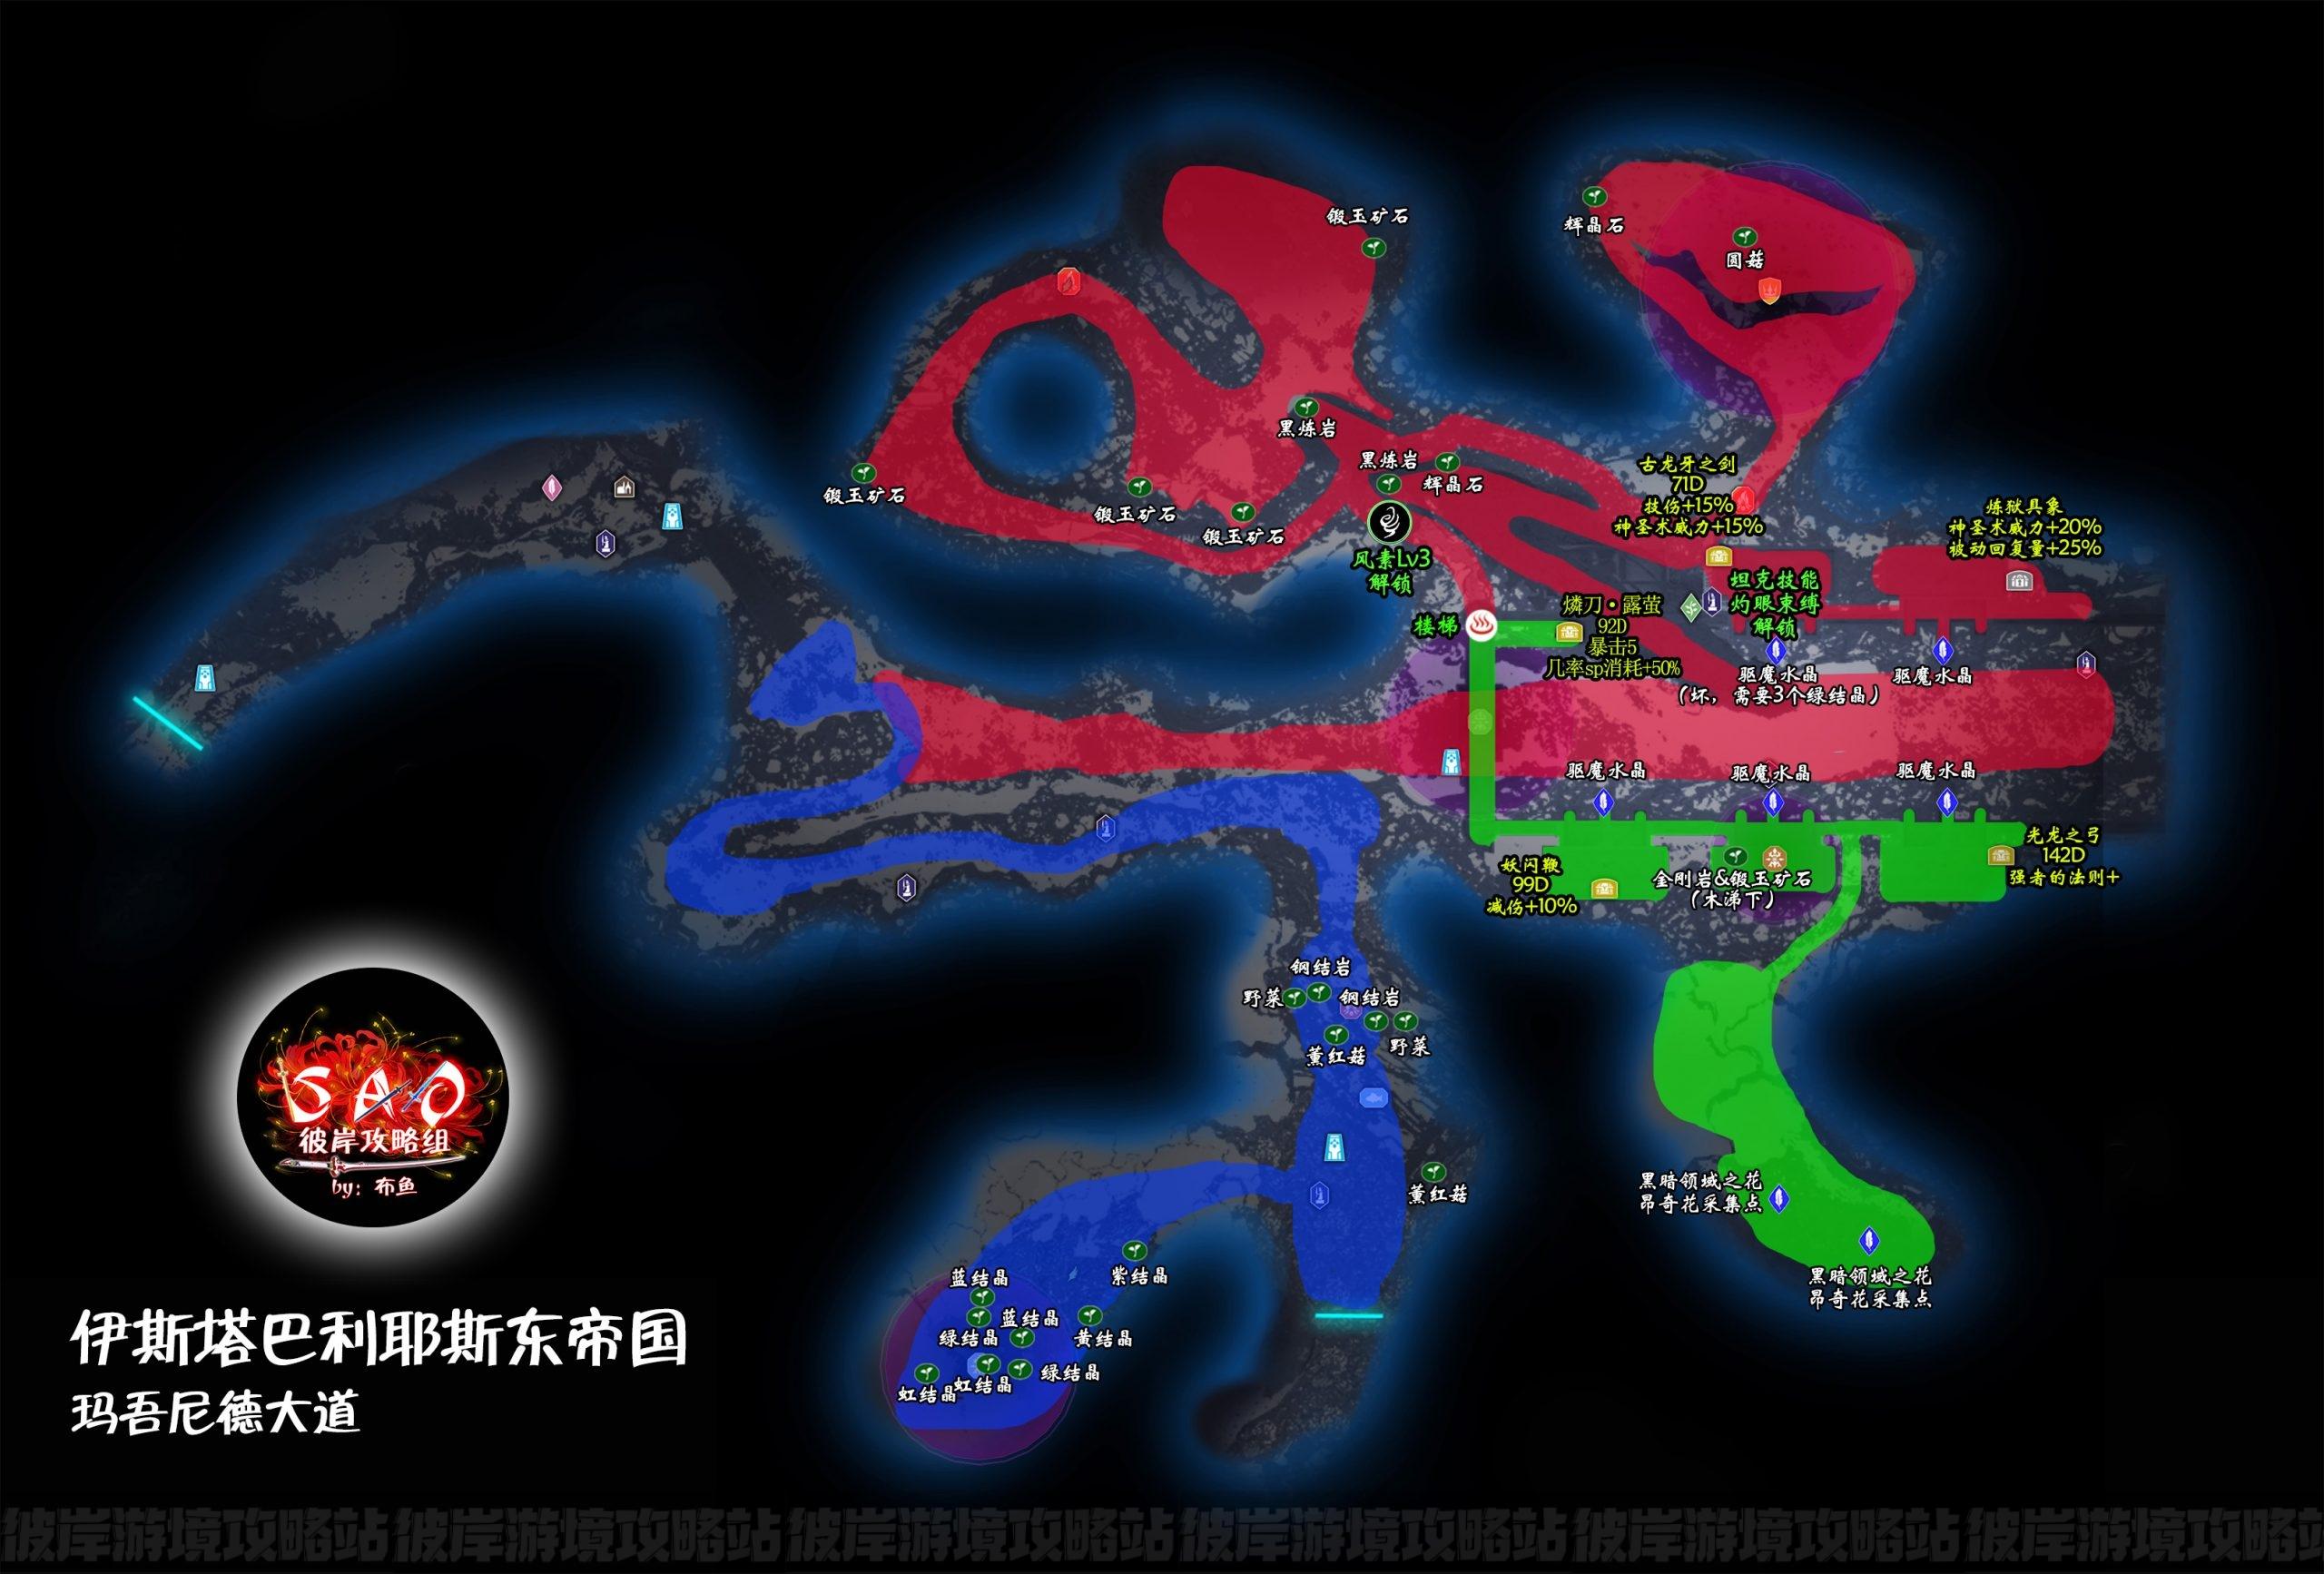 【SAOAL攻略组】超完全流程地图攻略及新手指引-玛吾尼德大道篇-刀剑神域彼岸游境攻略站